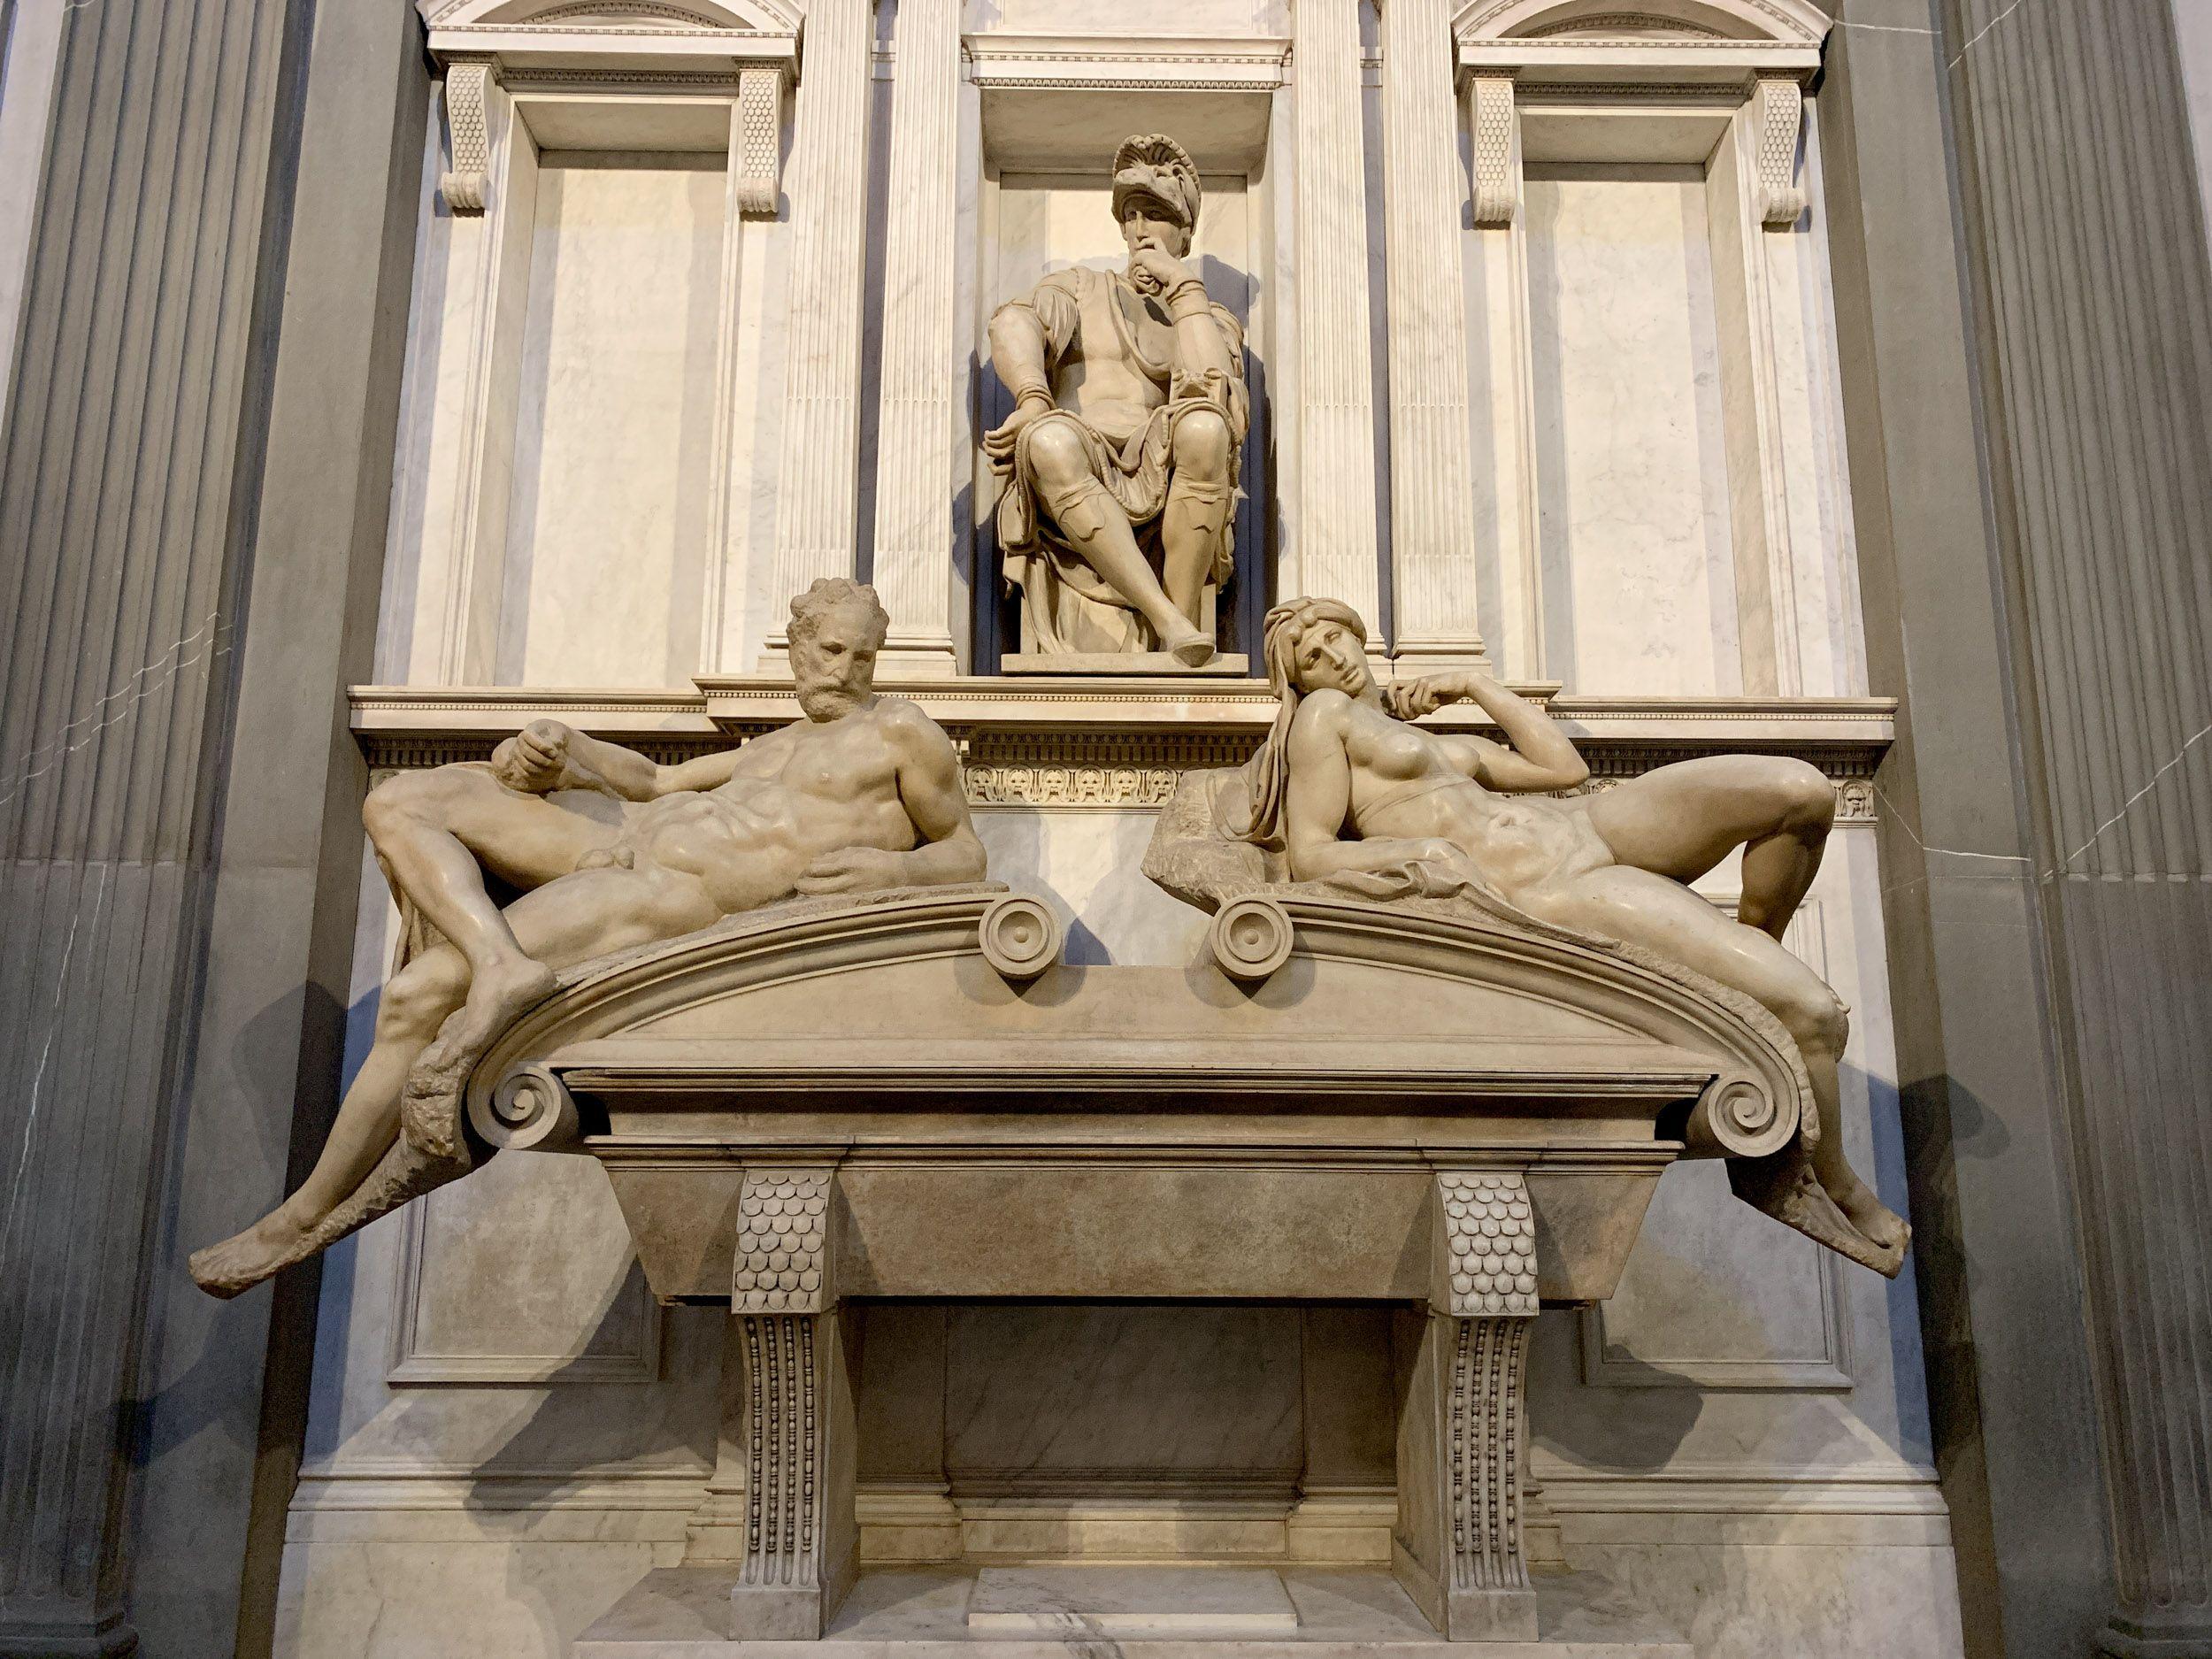 Tomb of Lorenzo di Piero de' Medici